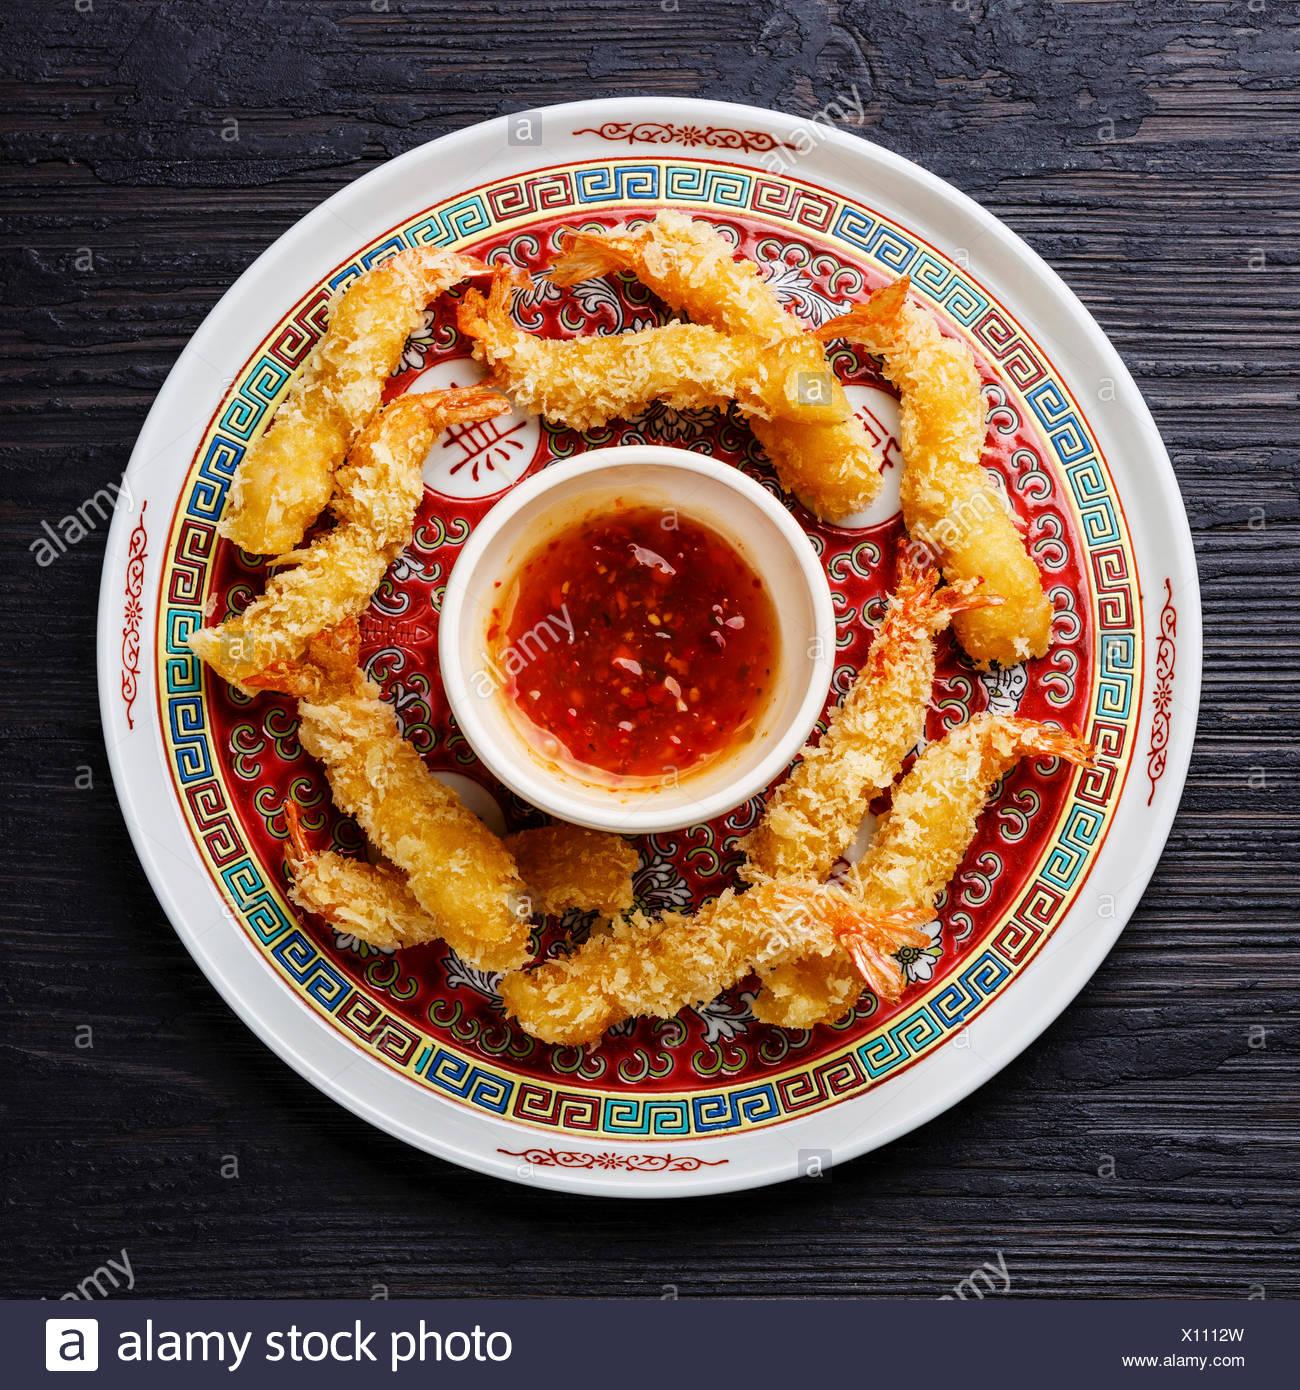 Deep fried breaded Tempura prawn shrimps with sauce on black burned wooden background - Stock Image